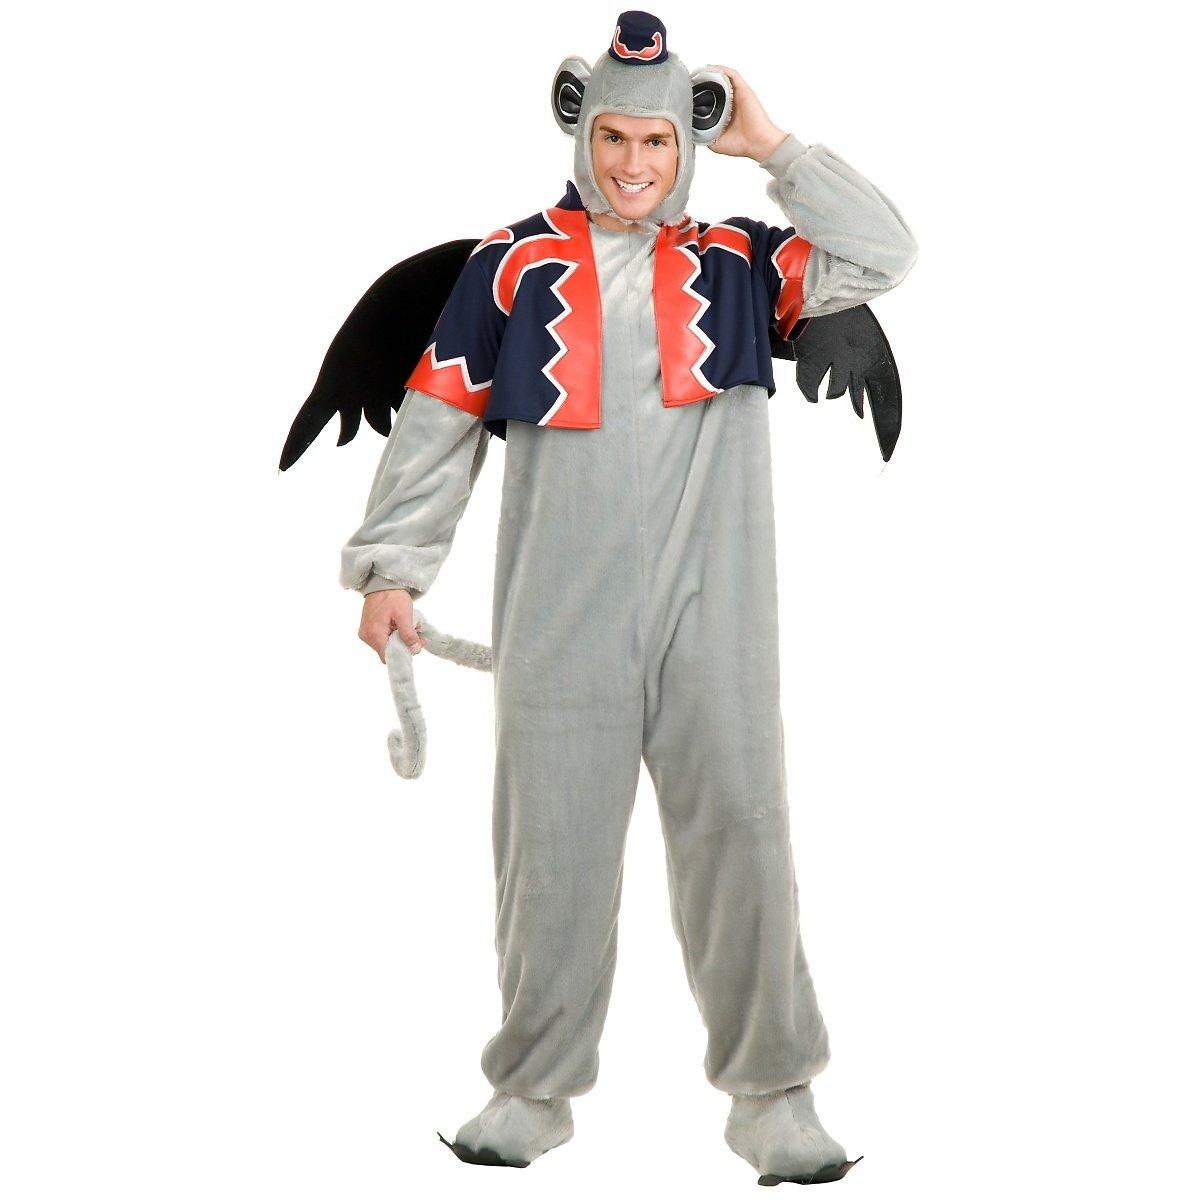 Amazon.com: Adult Men's Winged Wizard of Oz Flying Monkey Costume ...